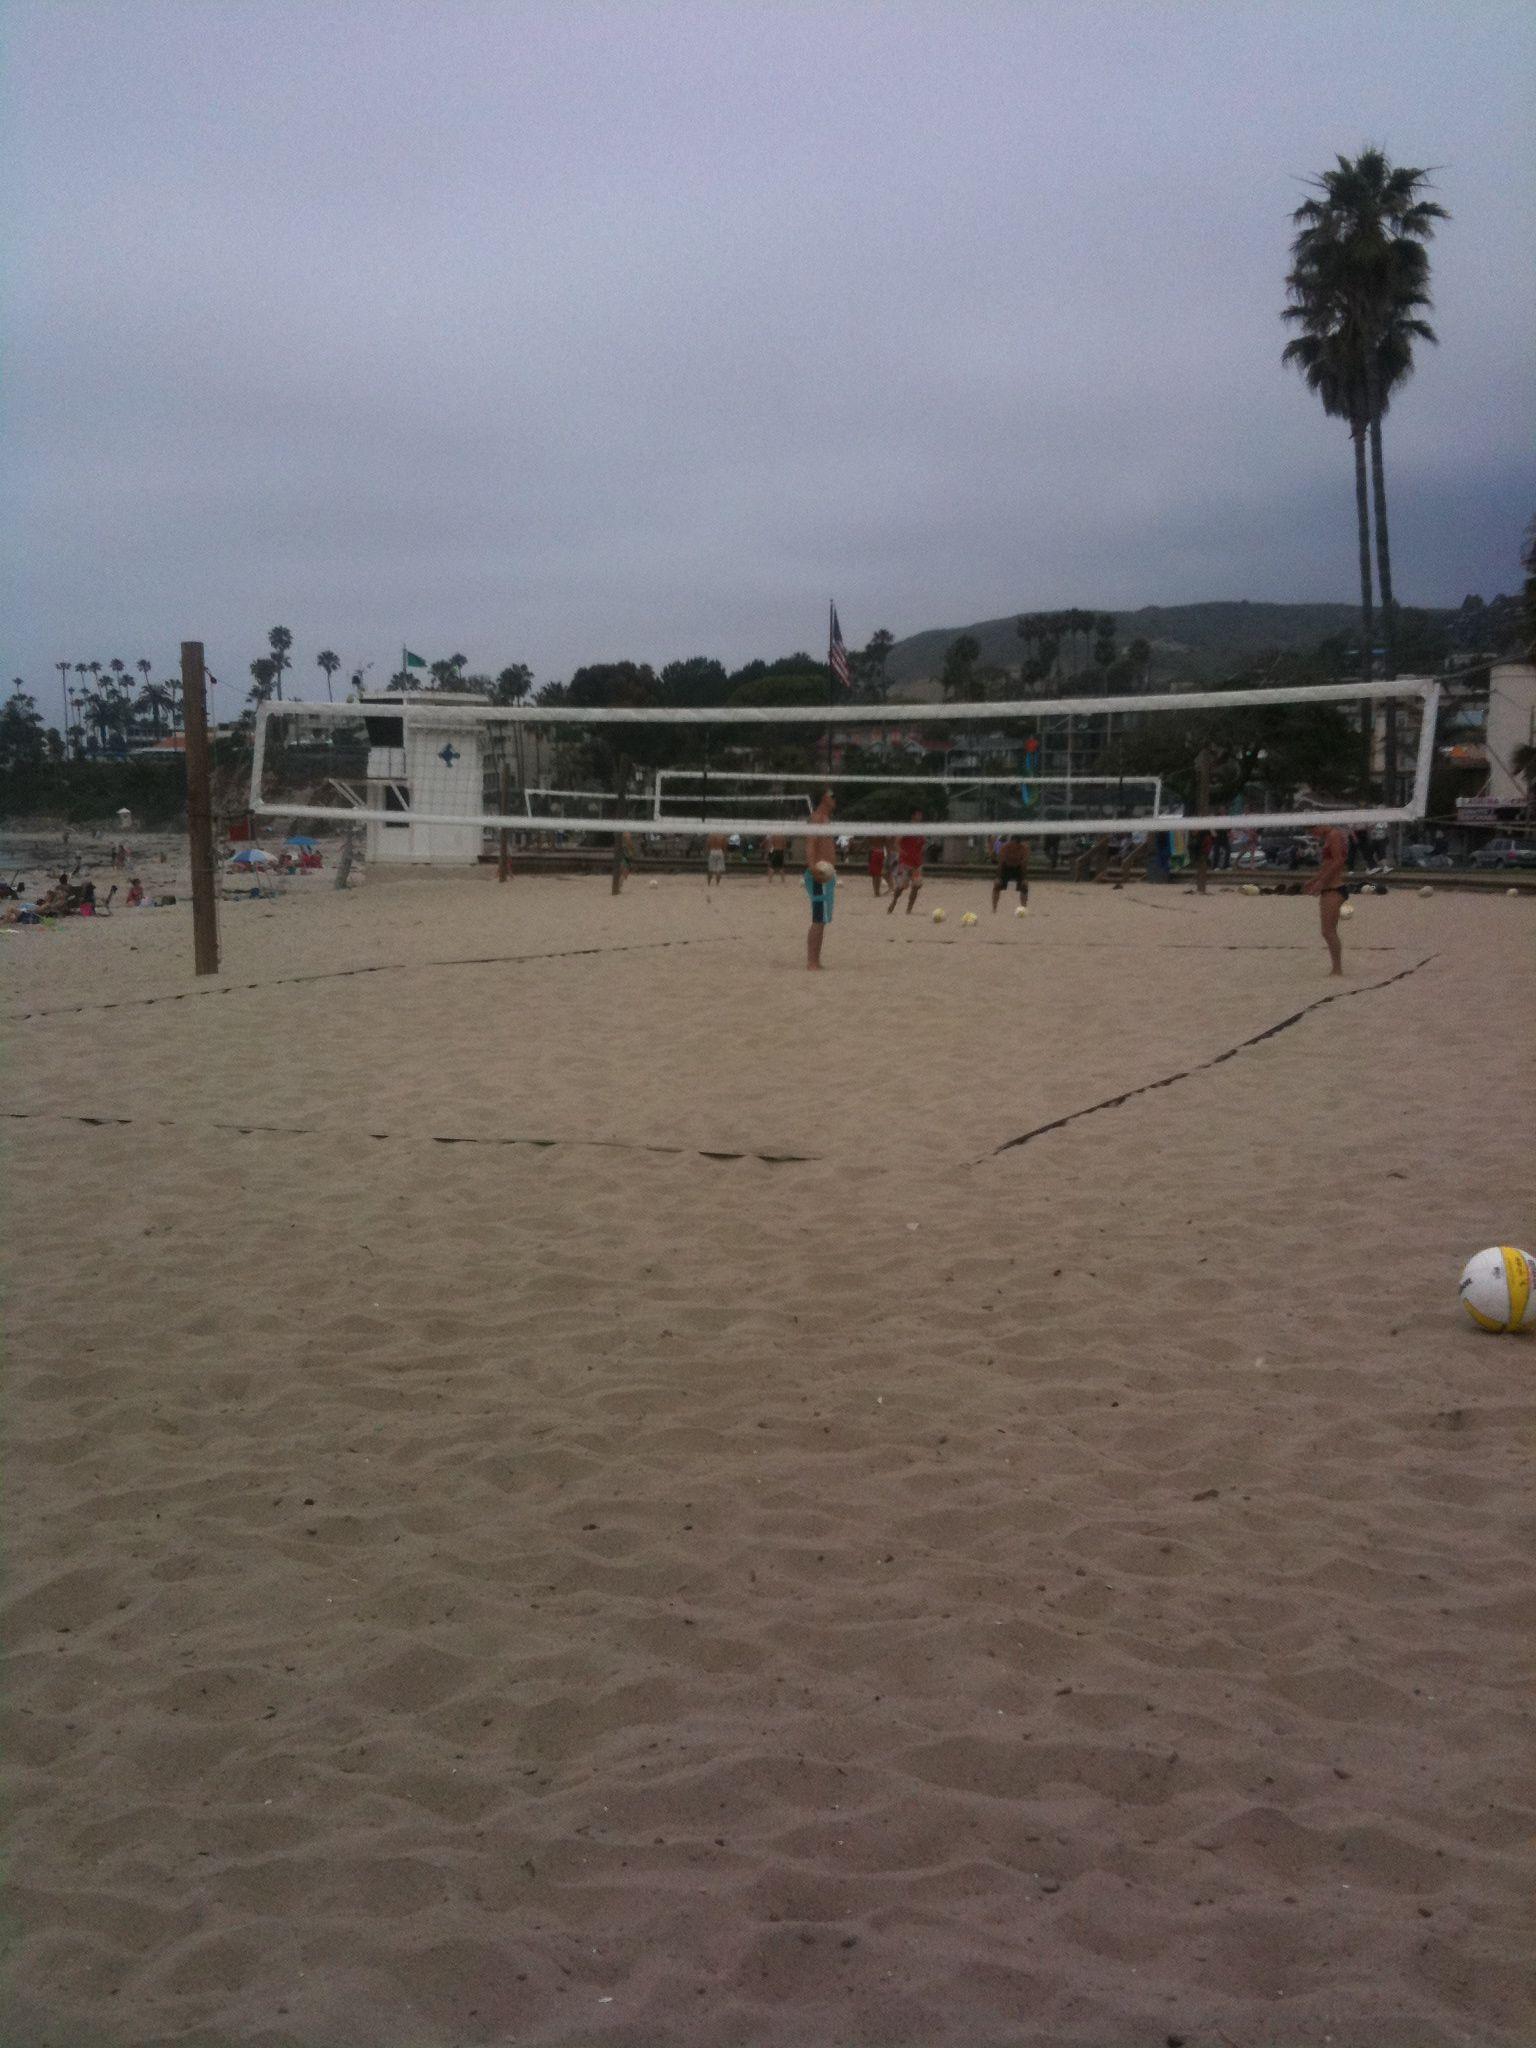 Iconic Southern California Laguna Beach Volleyball Court Beach Volleyball Court Laguna Beach Beach